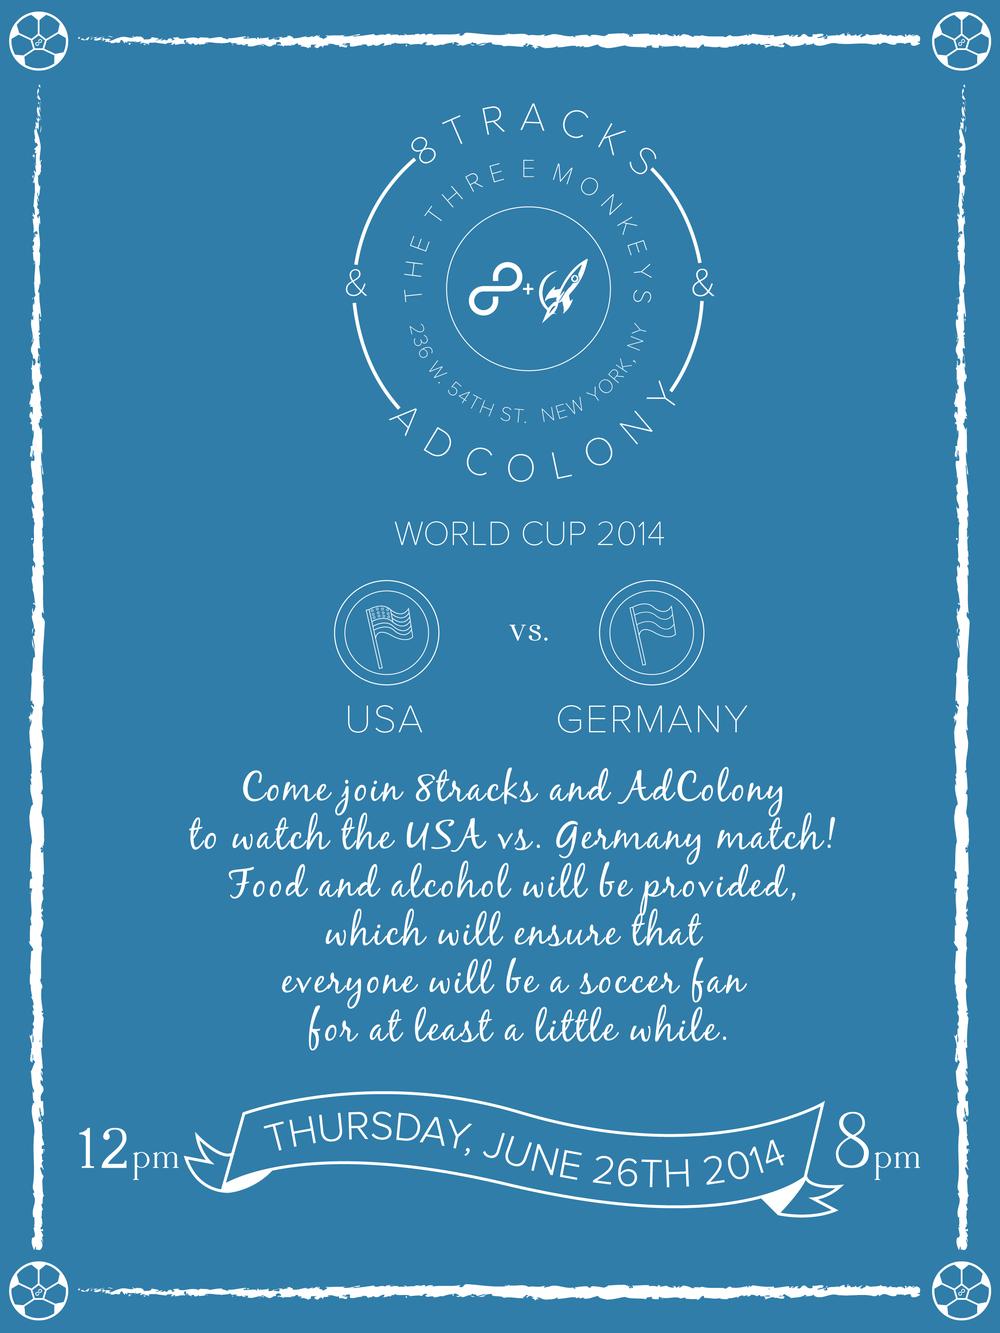 8tracks x Adcolony World Cup brand/identity, visual design, printdesign